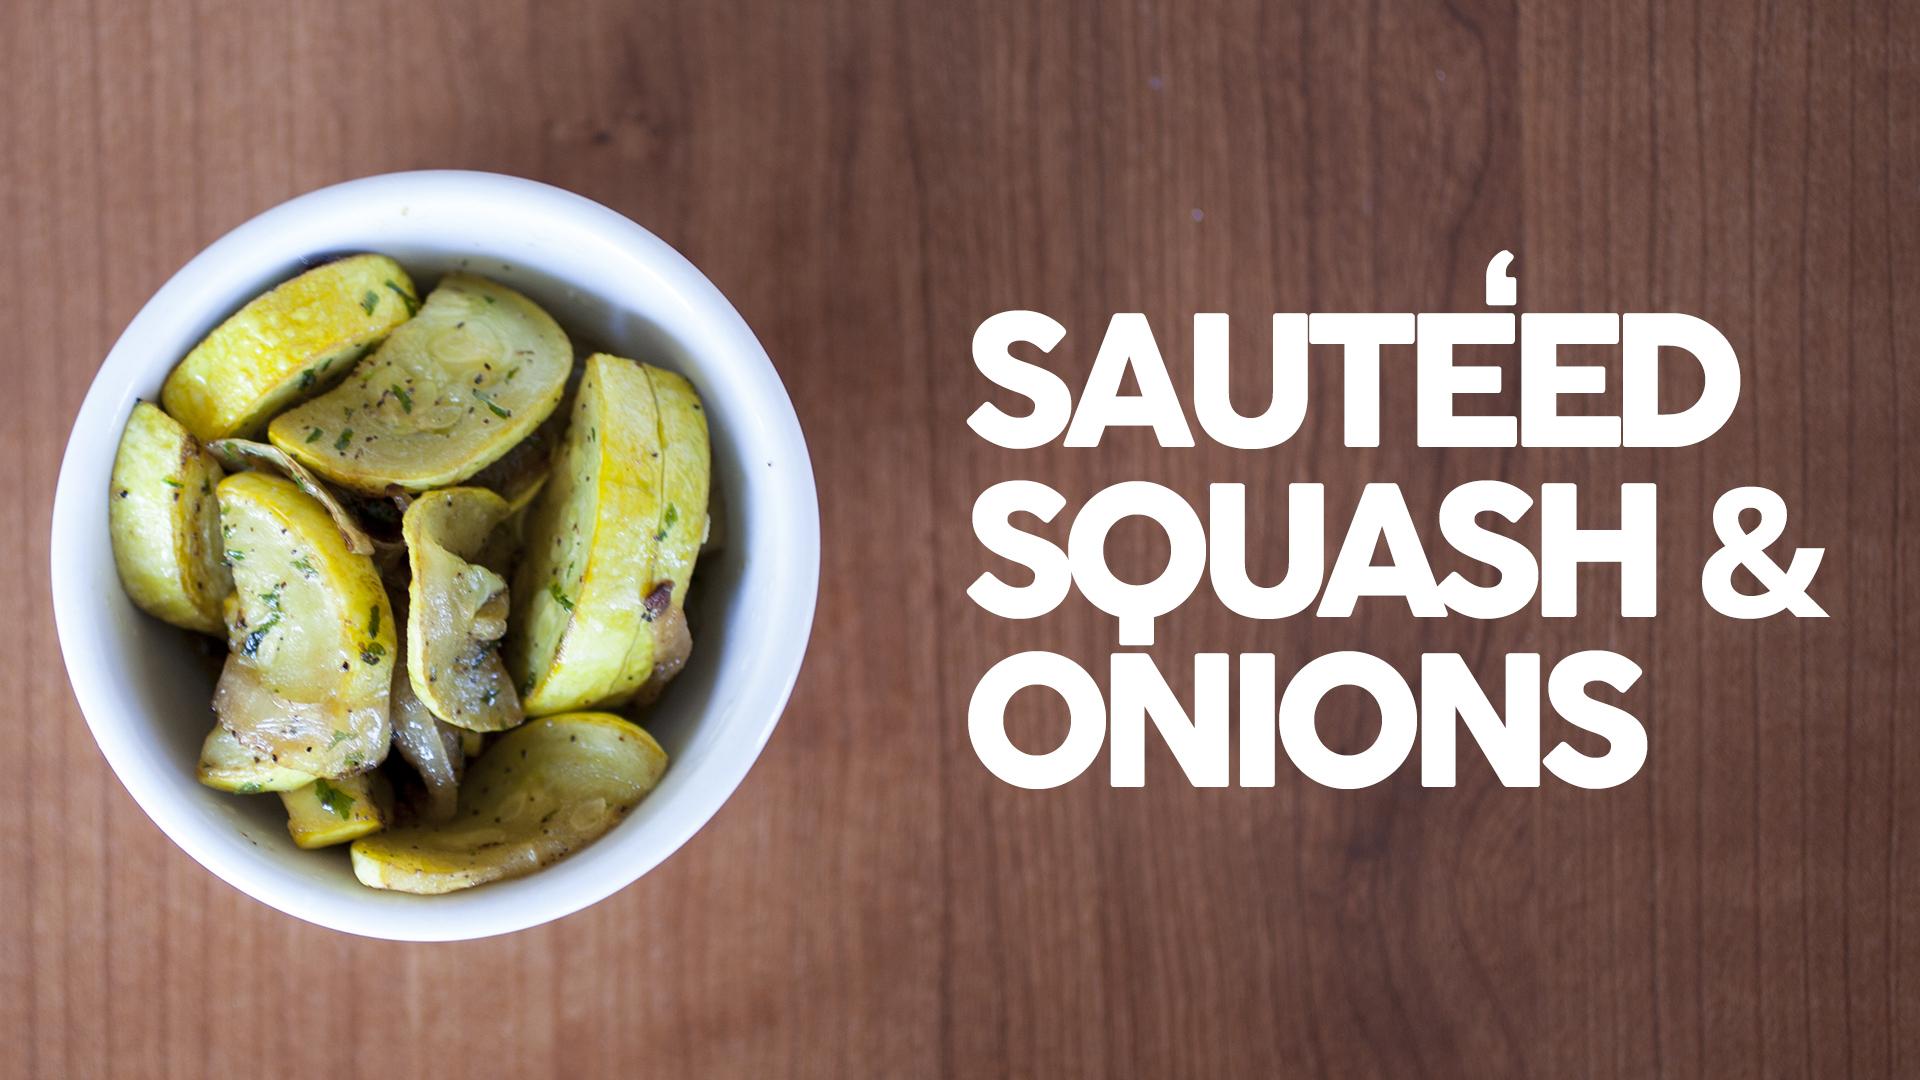 Sautéed Squash & Onions